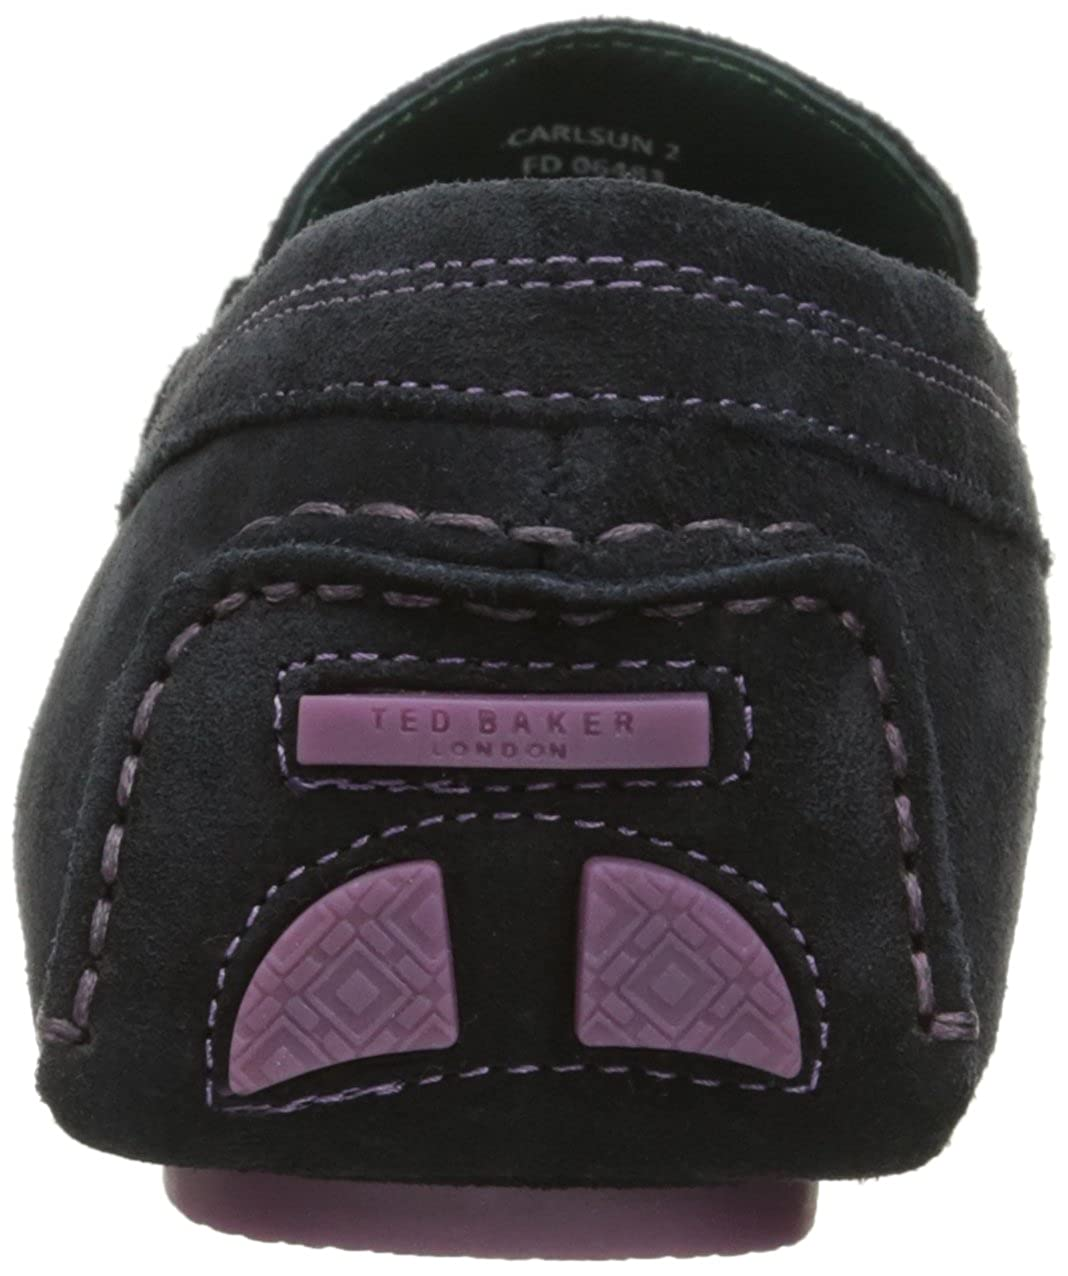 8d9c3bbcc84 Amazon.com  Ted Baker Men s Carlsun 2 Slip-On Loafer  Shoes